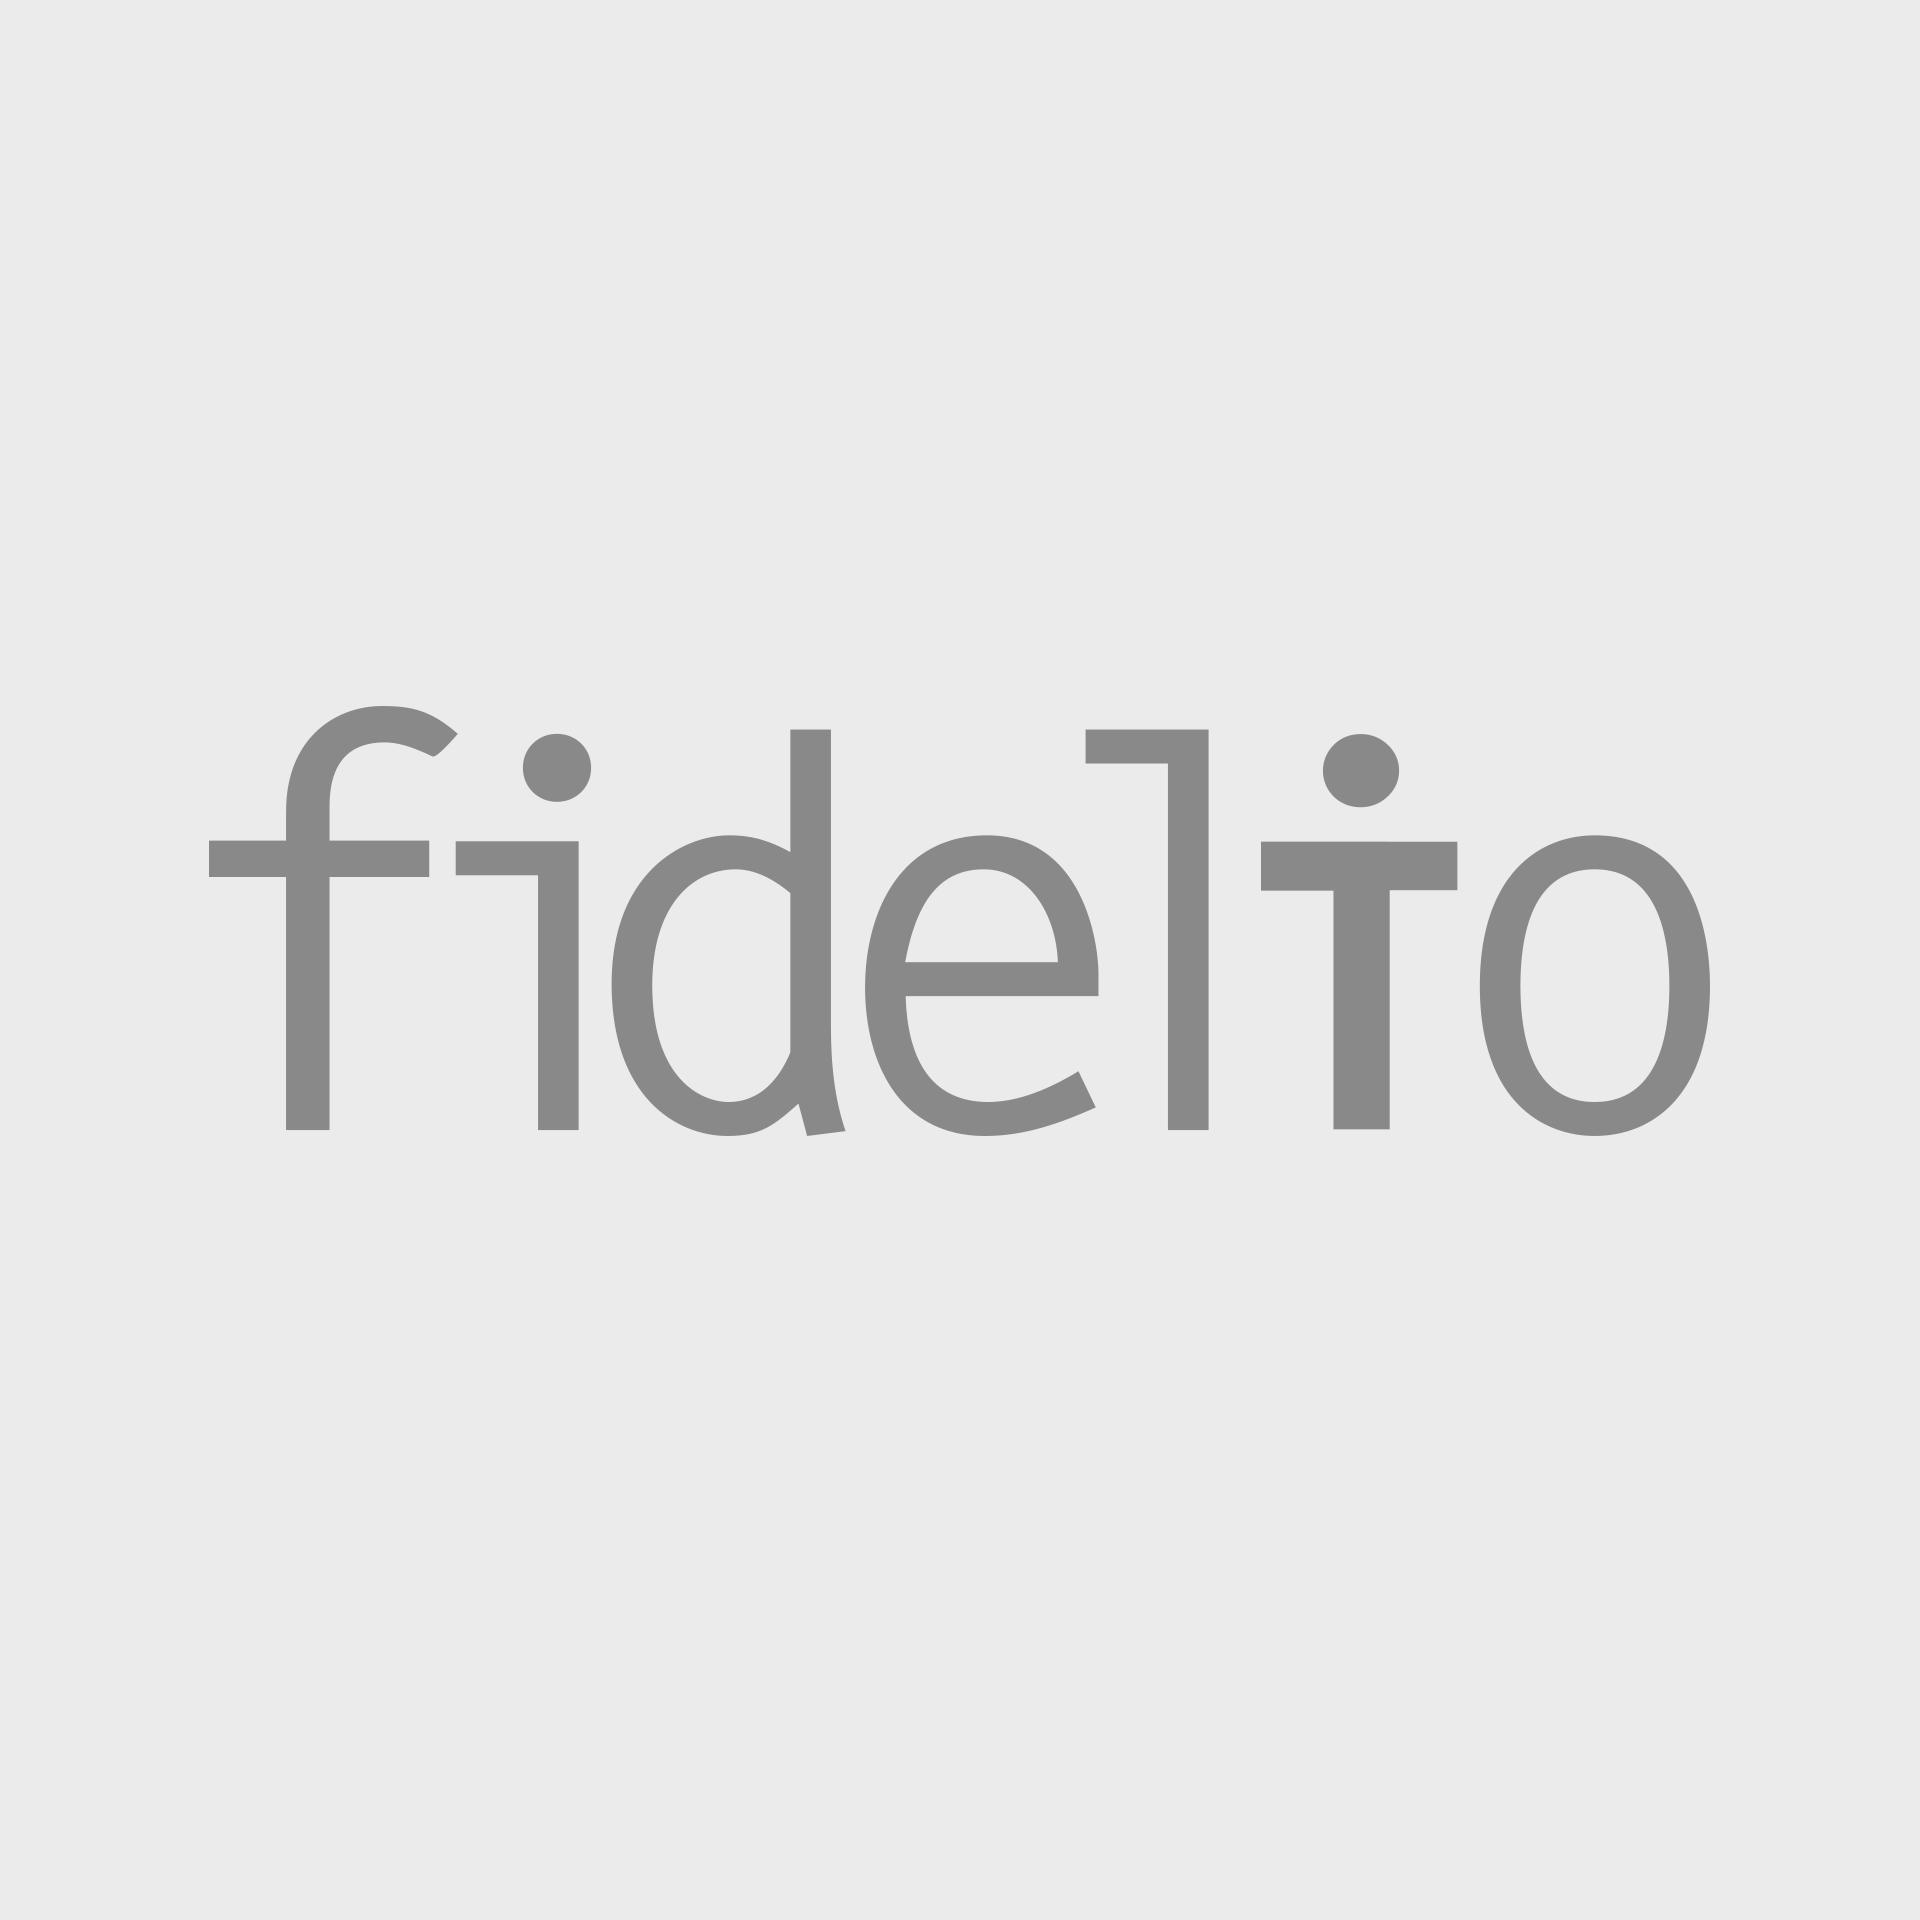 METU_FinnFilmnapok2020_LakyDora3-111528.png